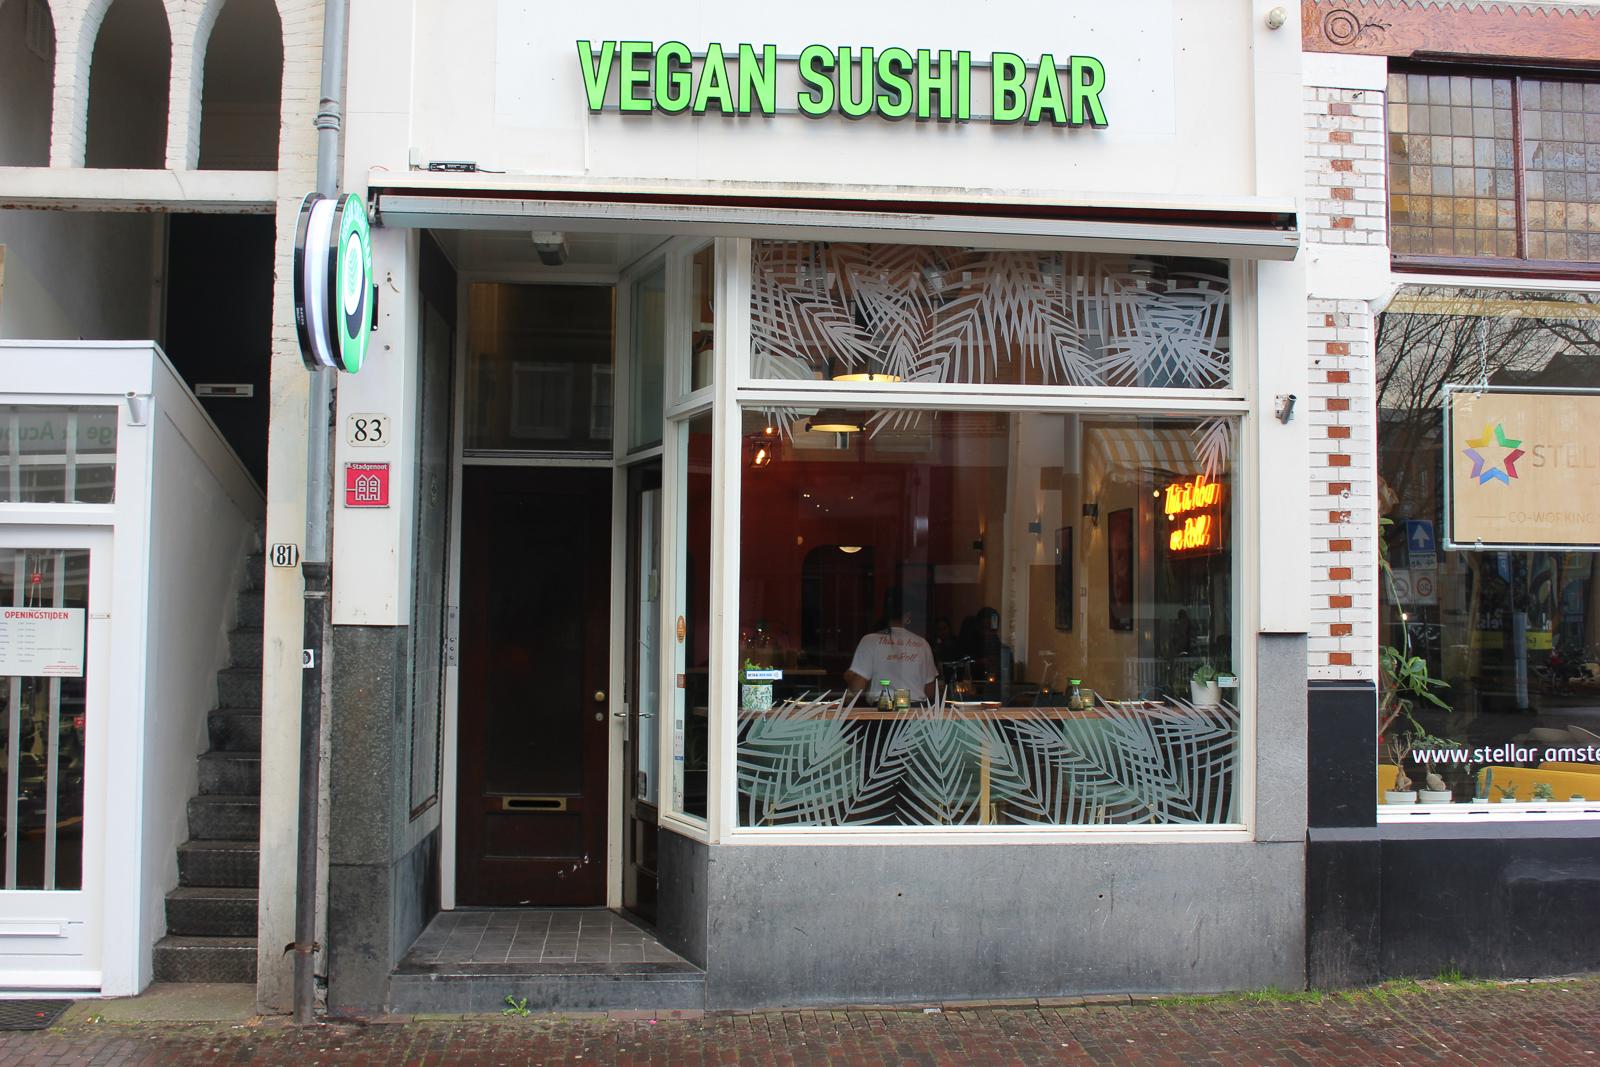 vegansushibaramsterdam